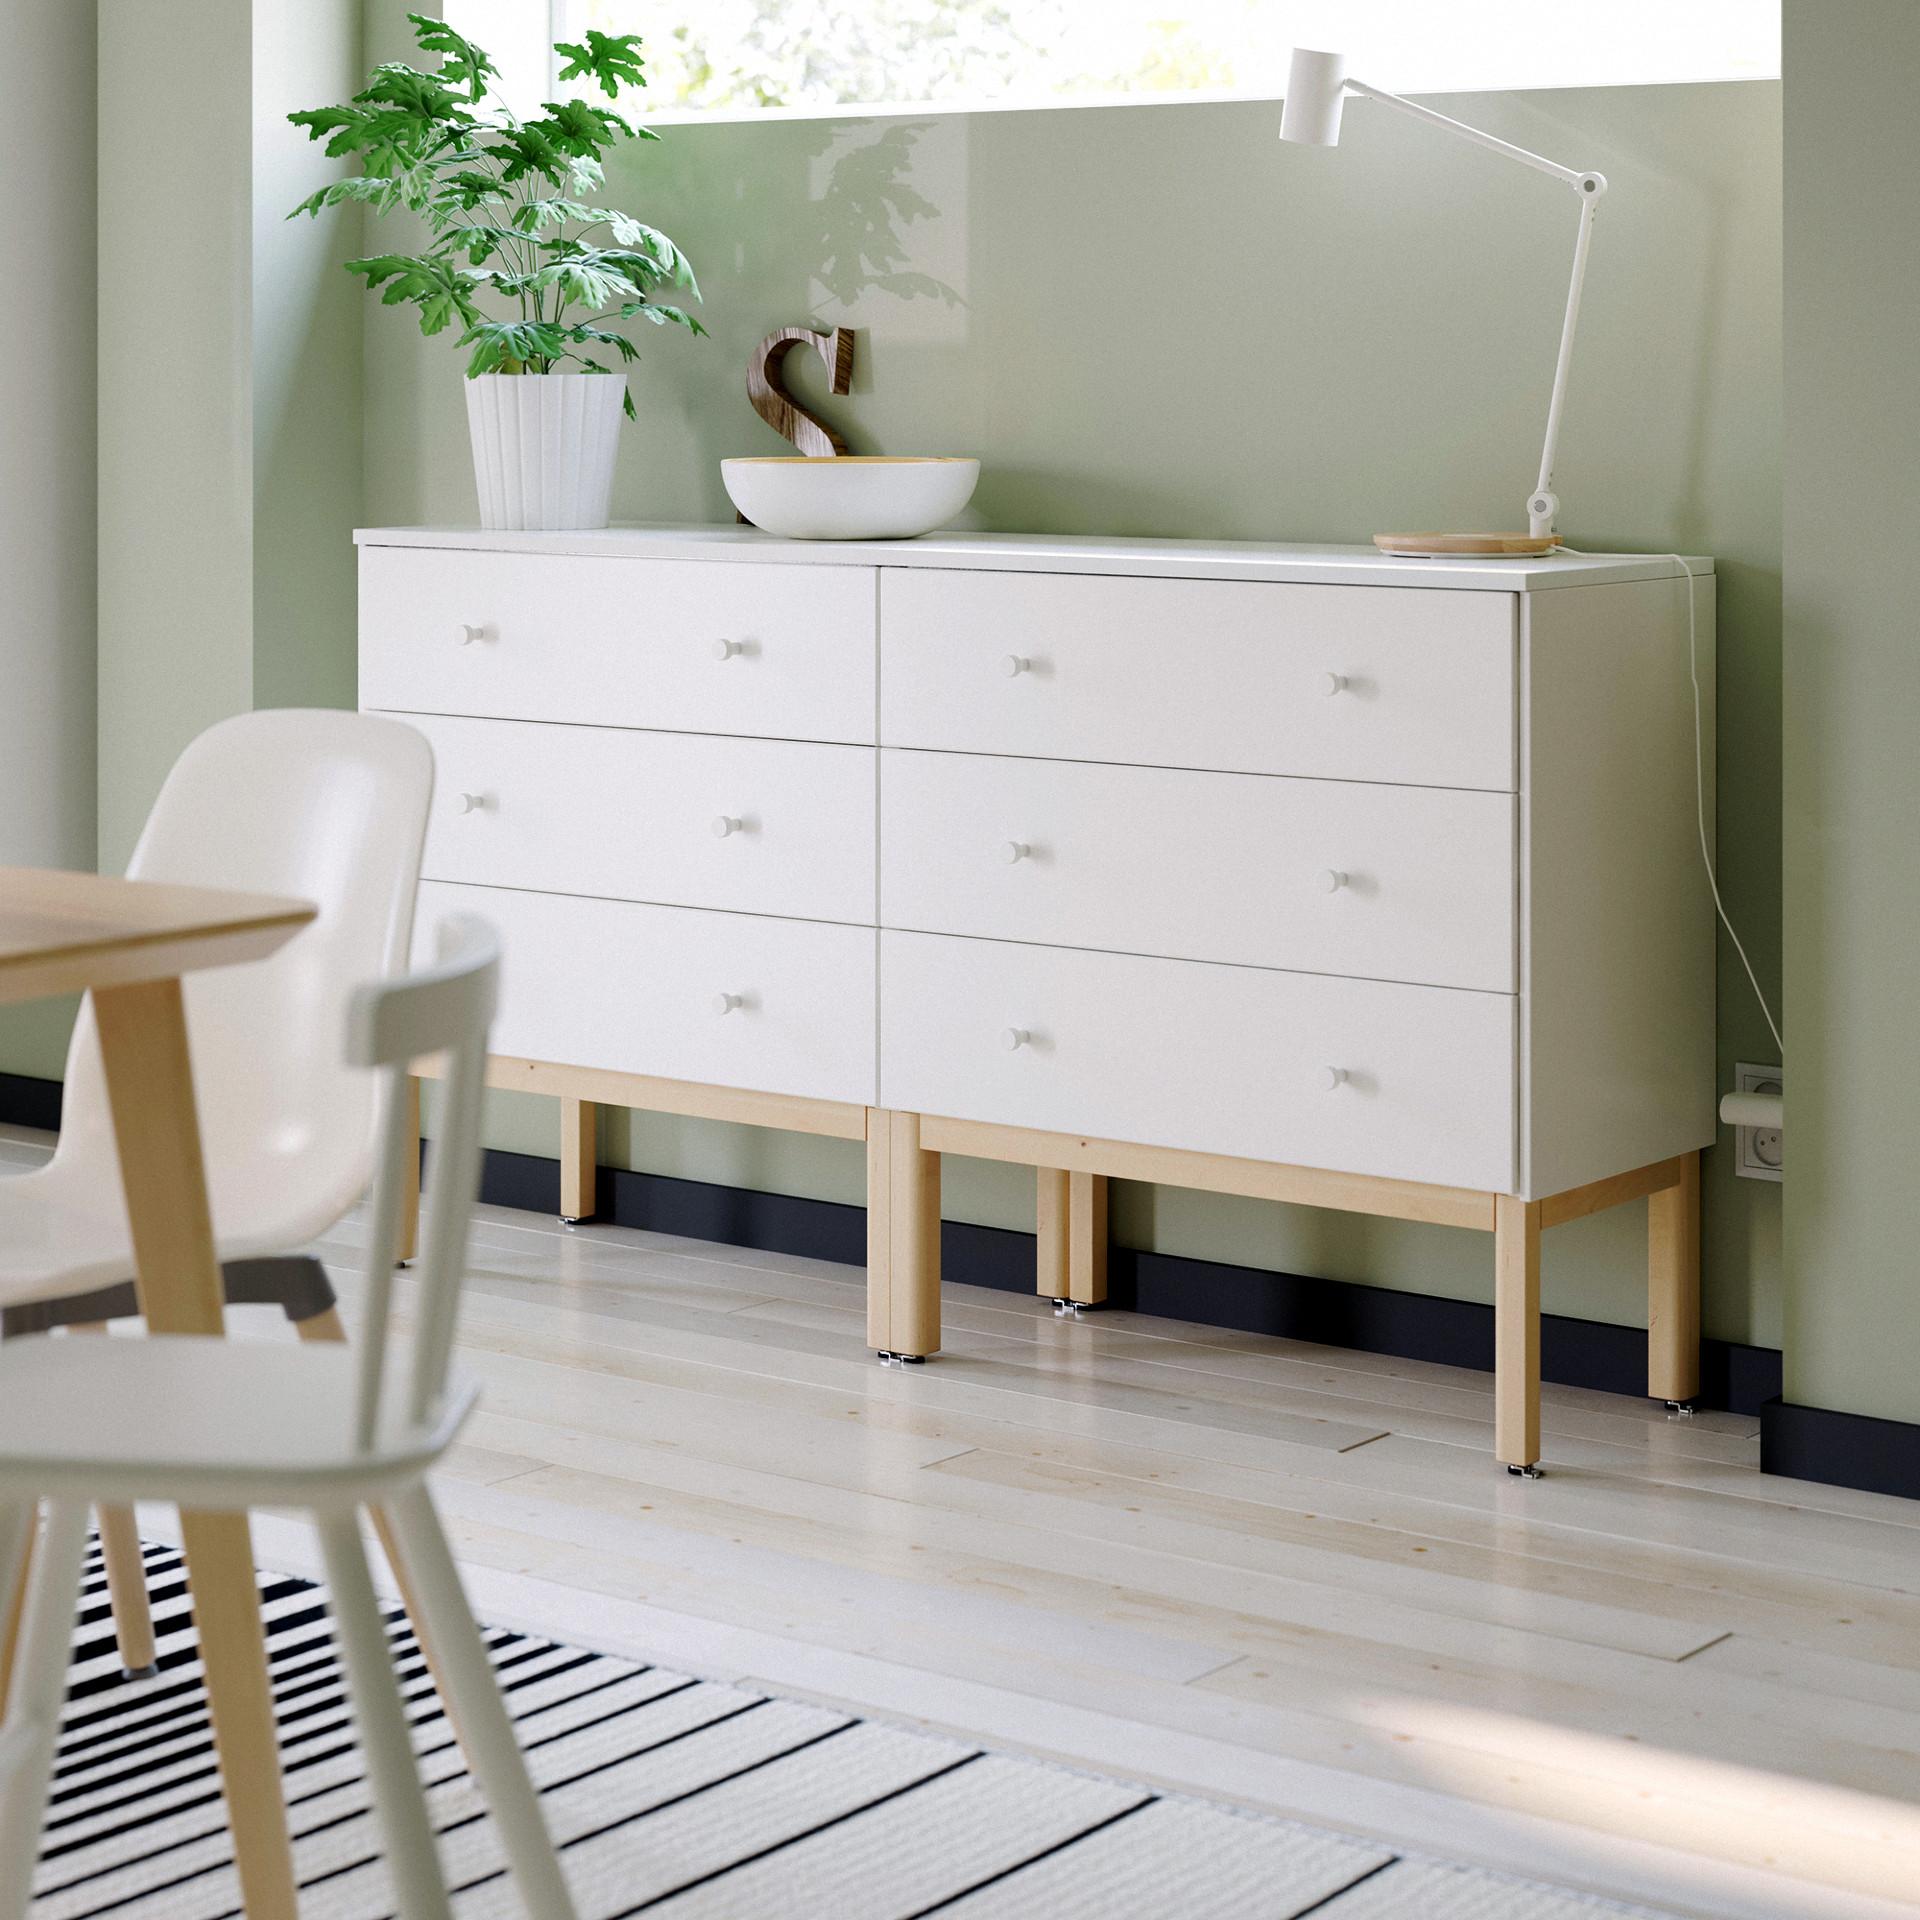 IKEA_002